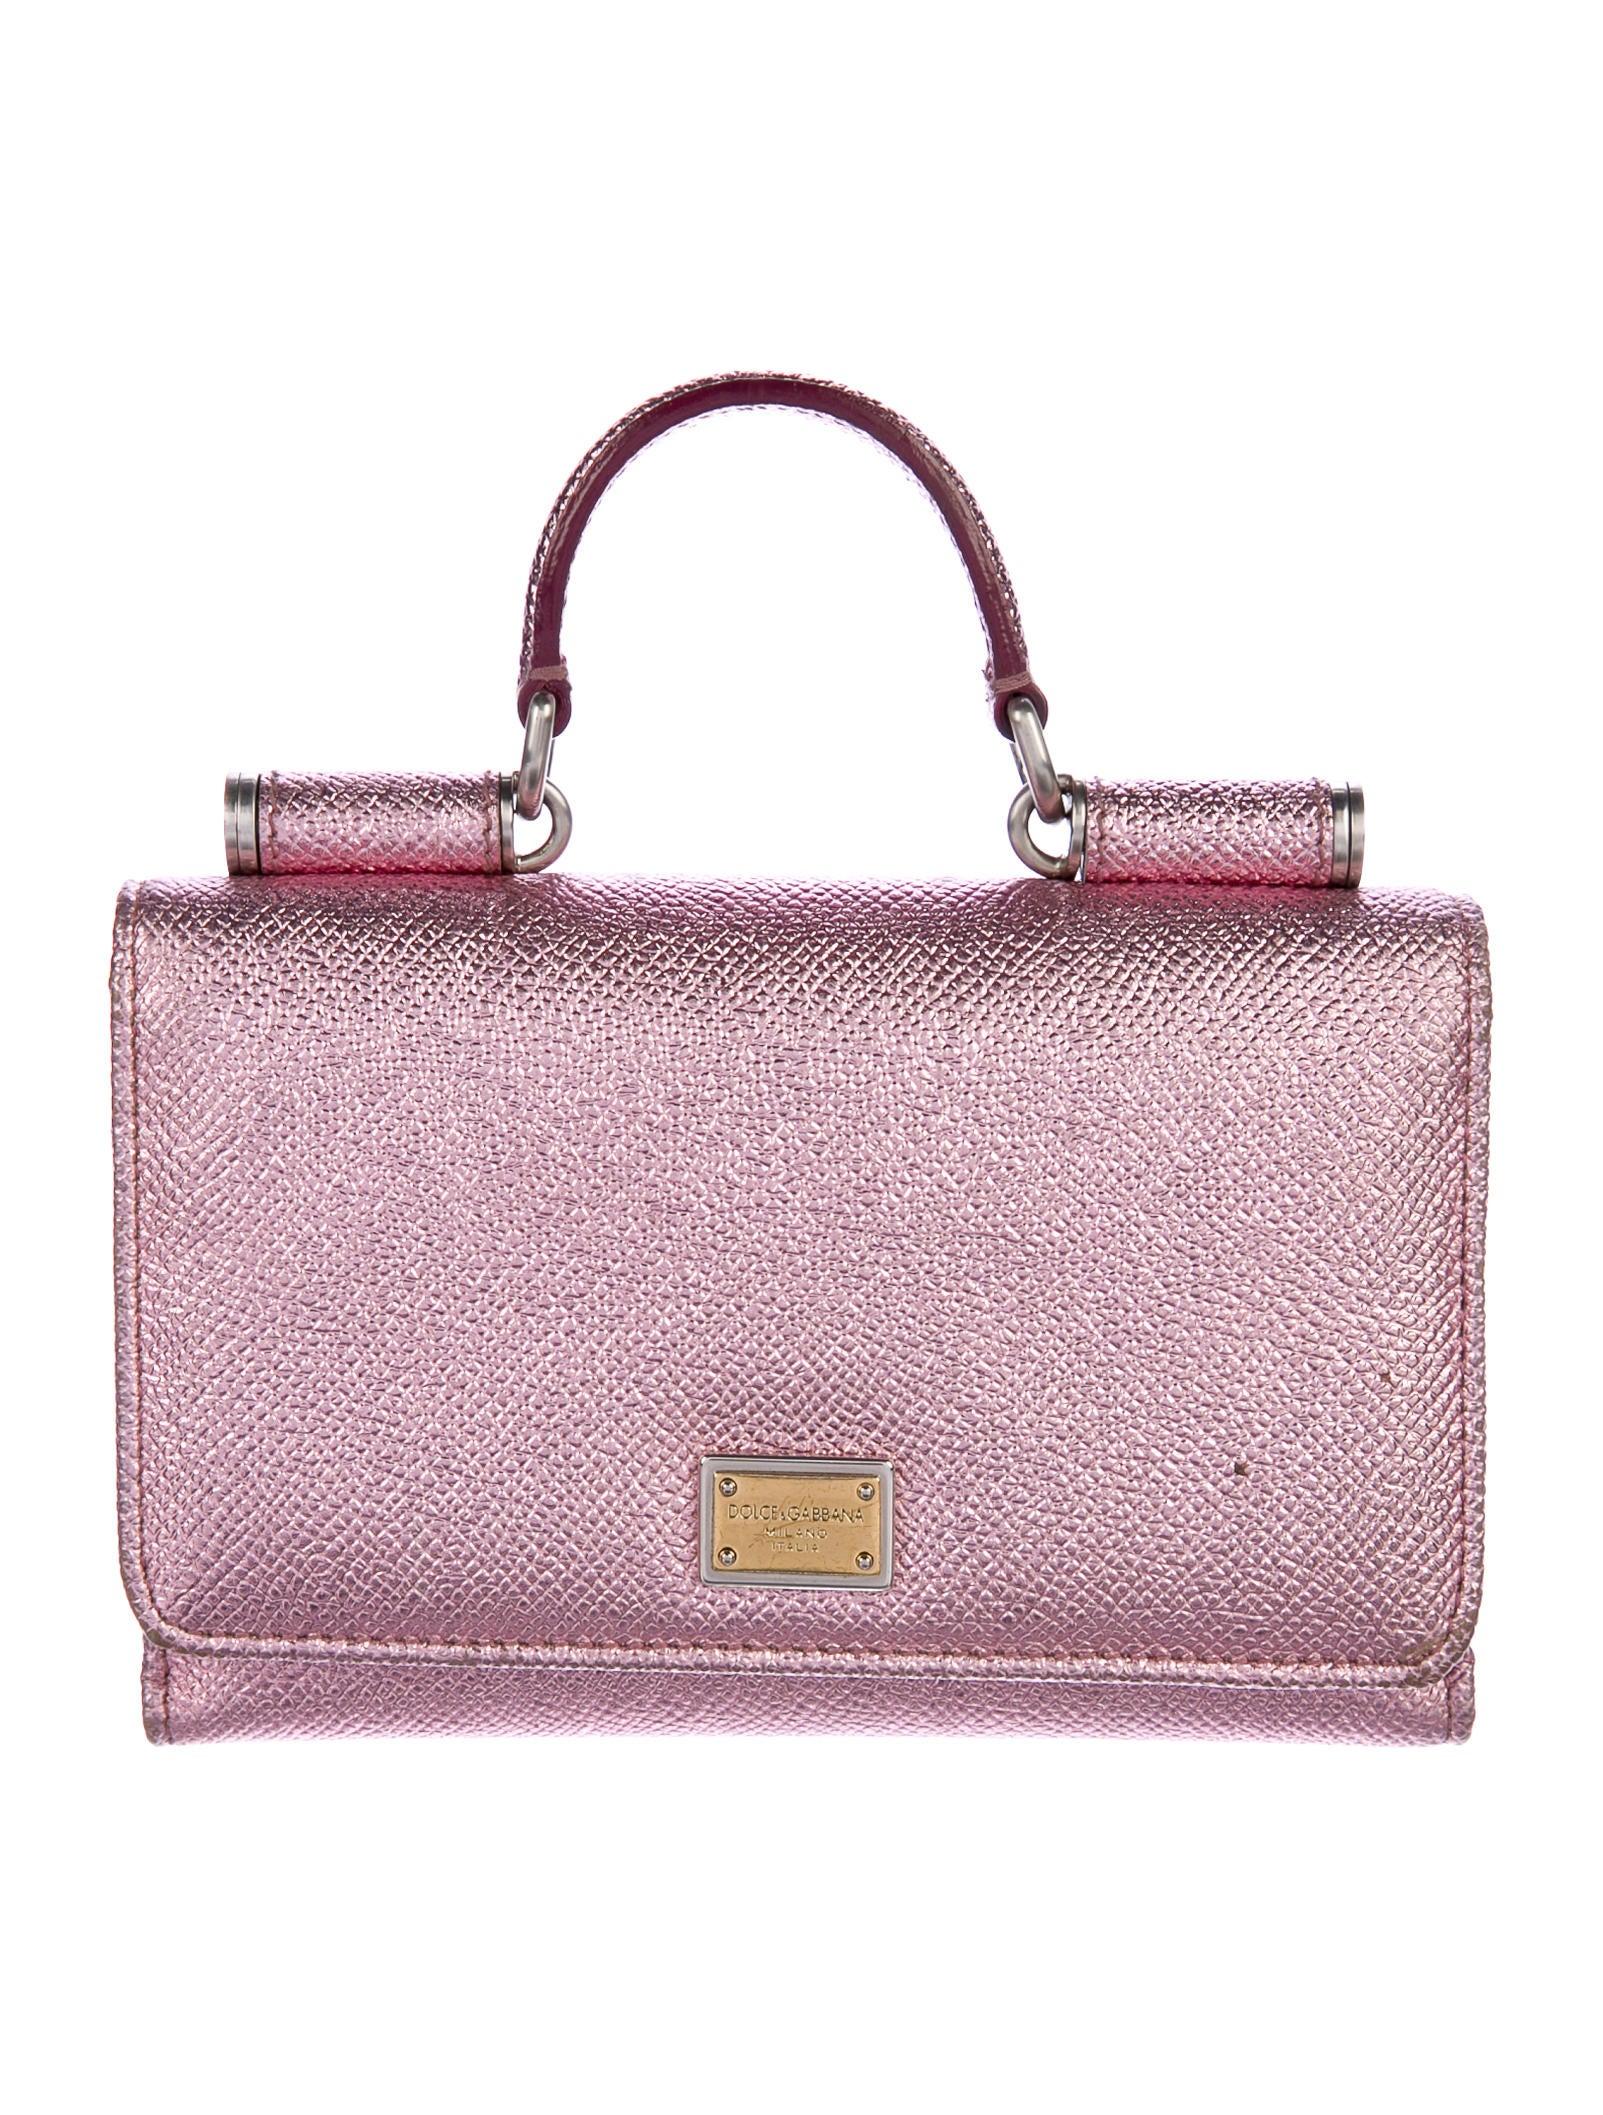 Dolce   Gabbana Sicily Von Bag - Accessories - DAG97841   The RealReal aab71ba114